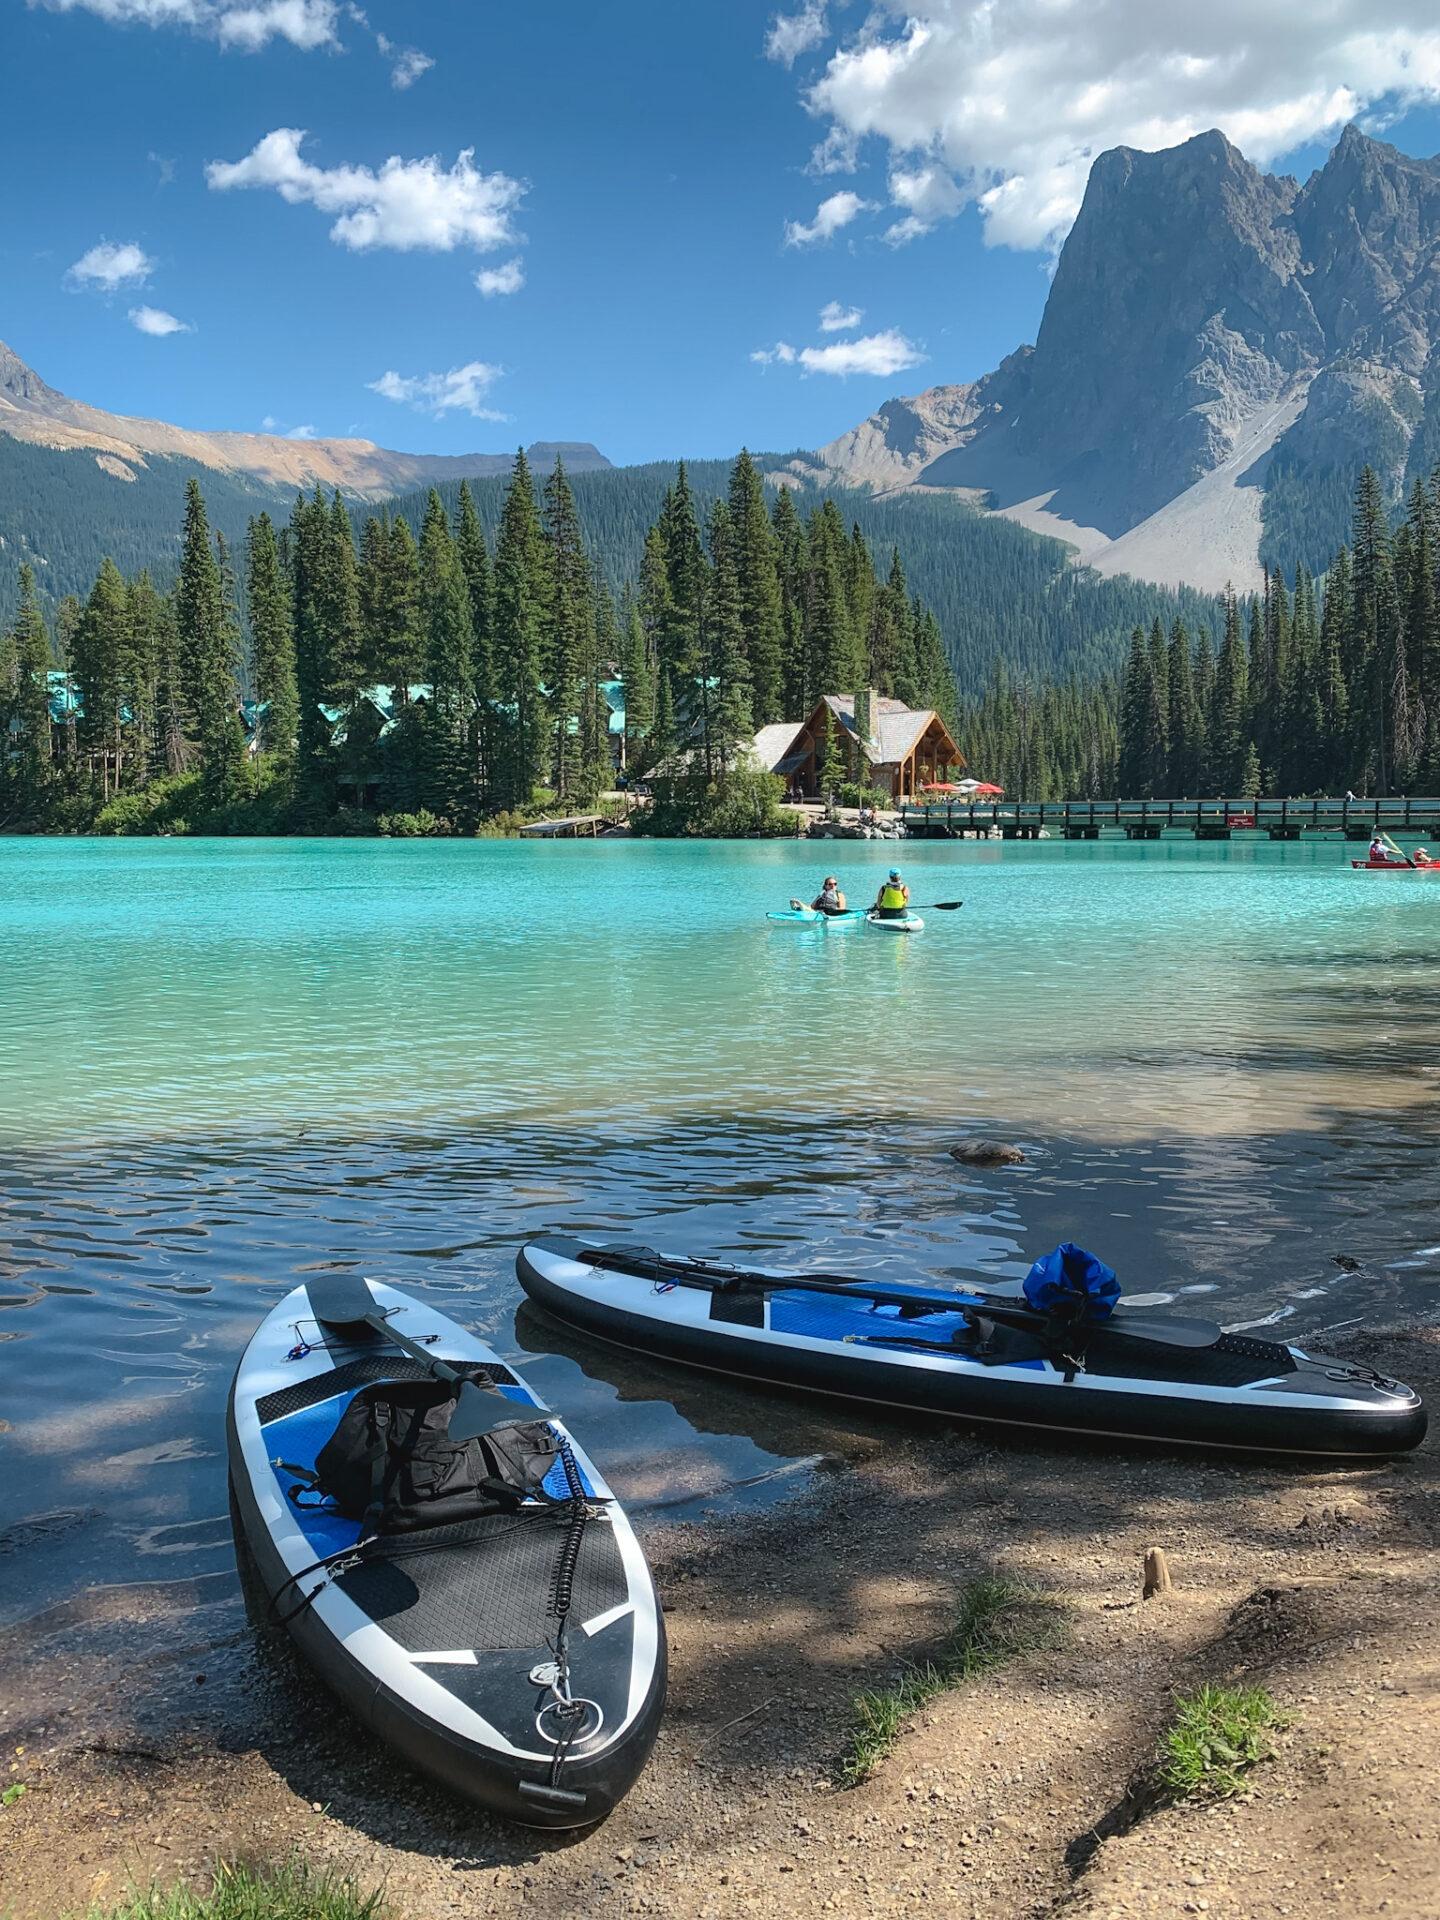 EVT Bikes SUP boards at Emerald Lake in Yoho National Park, British Columbia